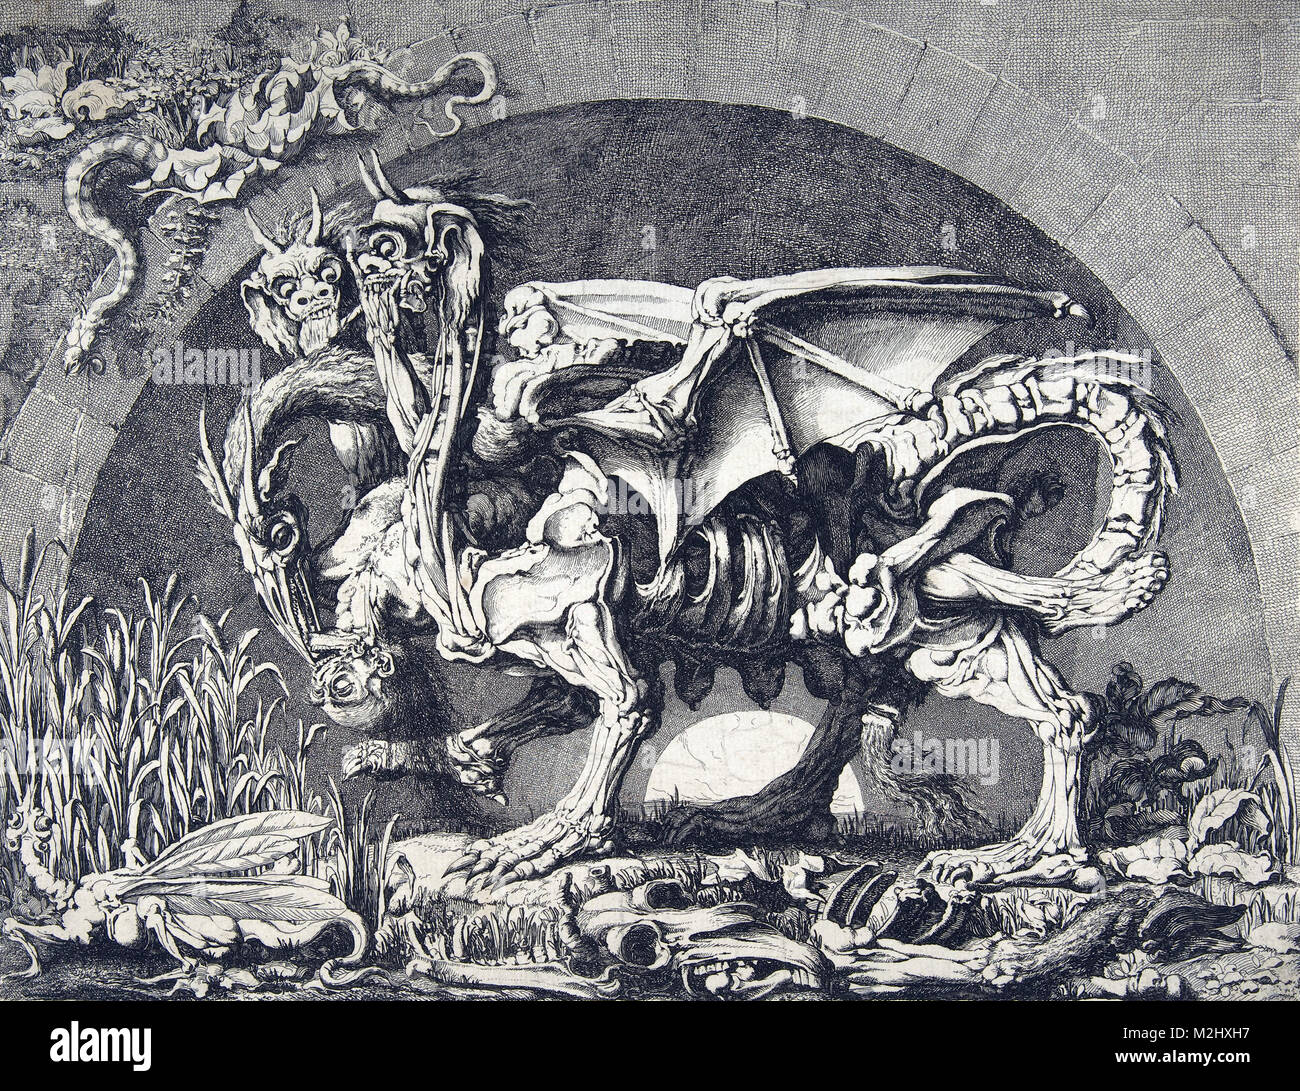 Chimera, Legendary Creature - Stock Image